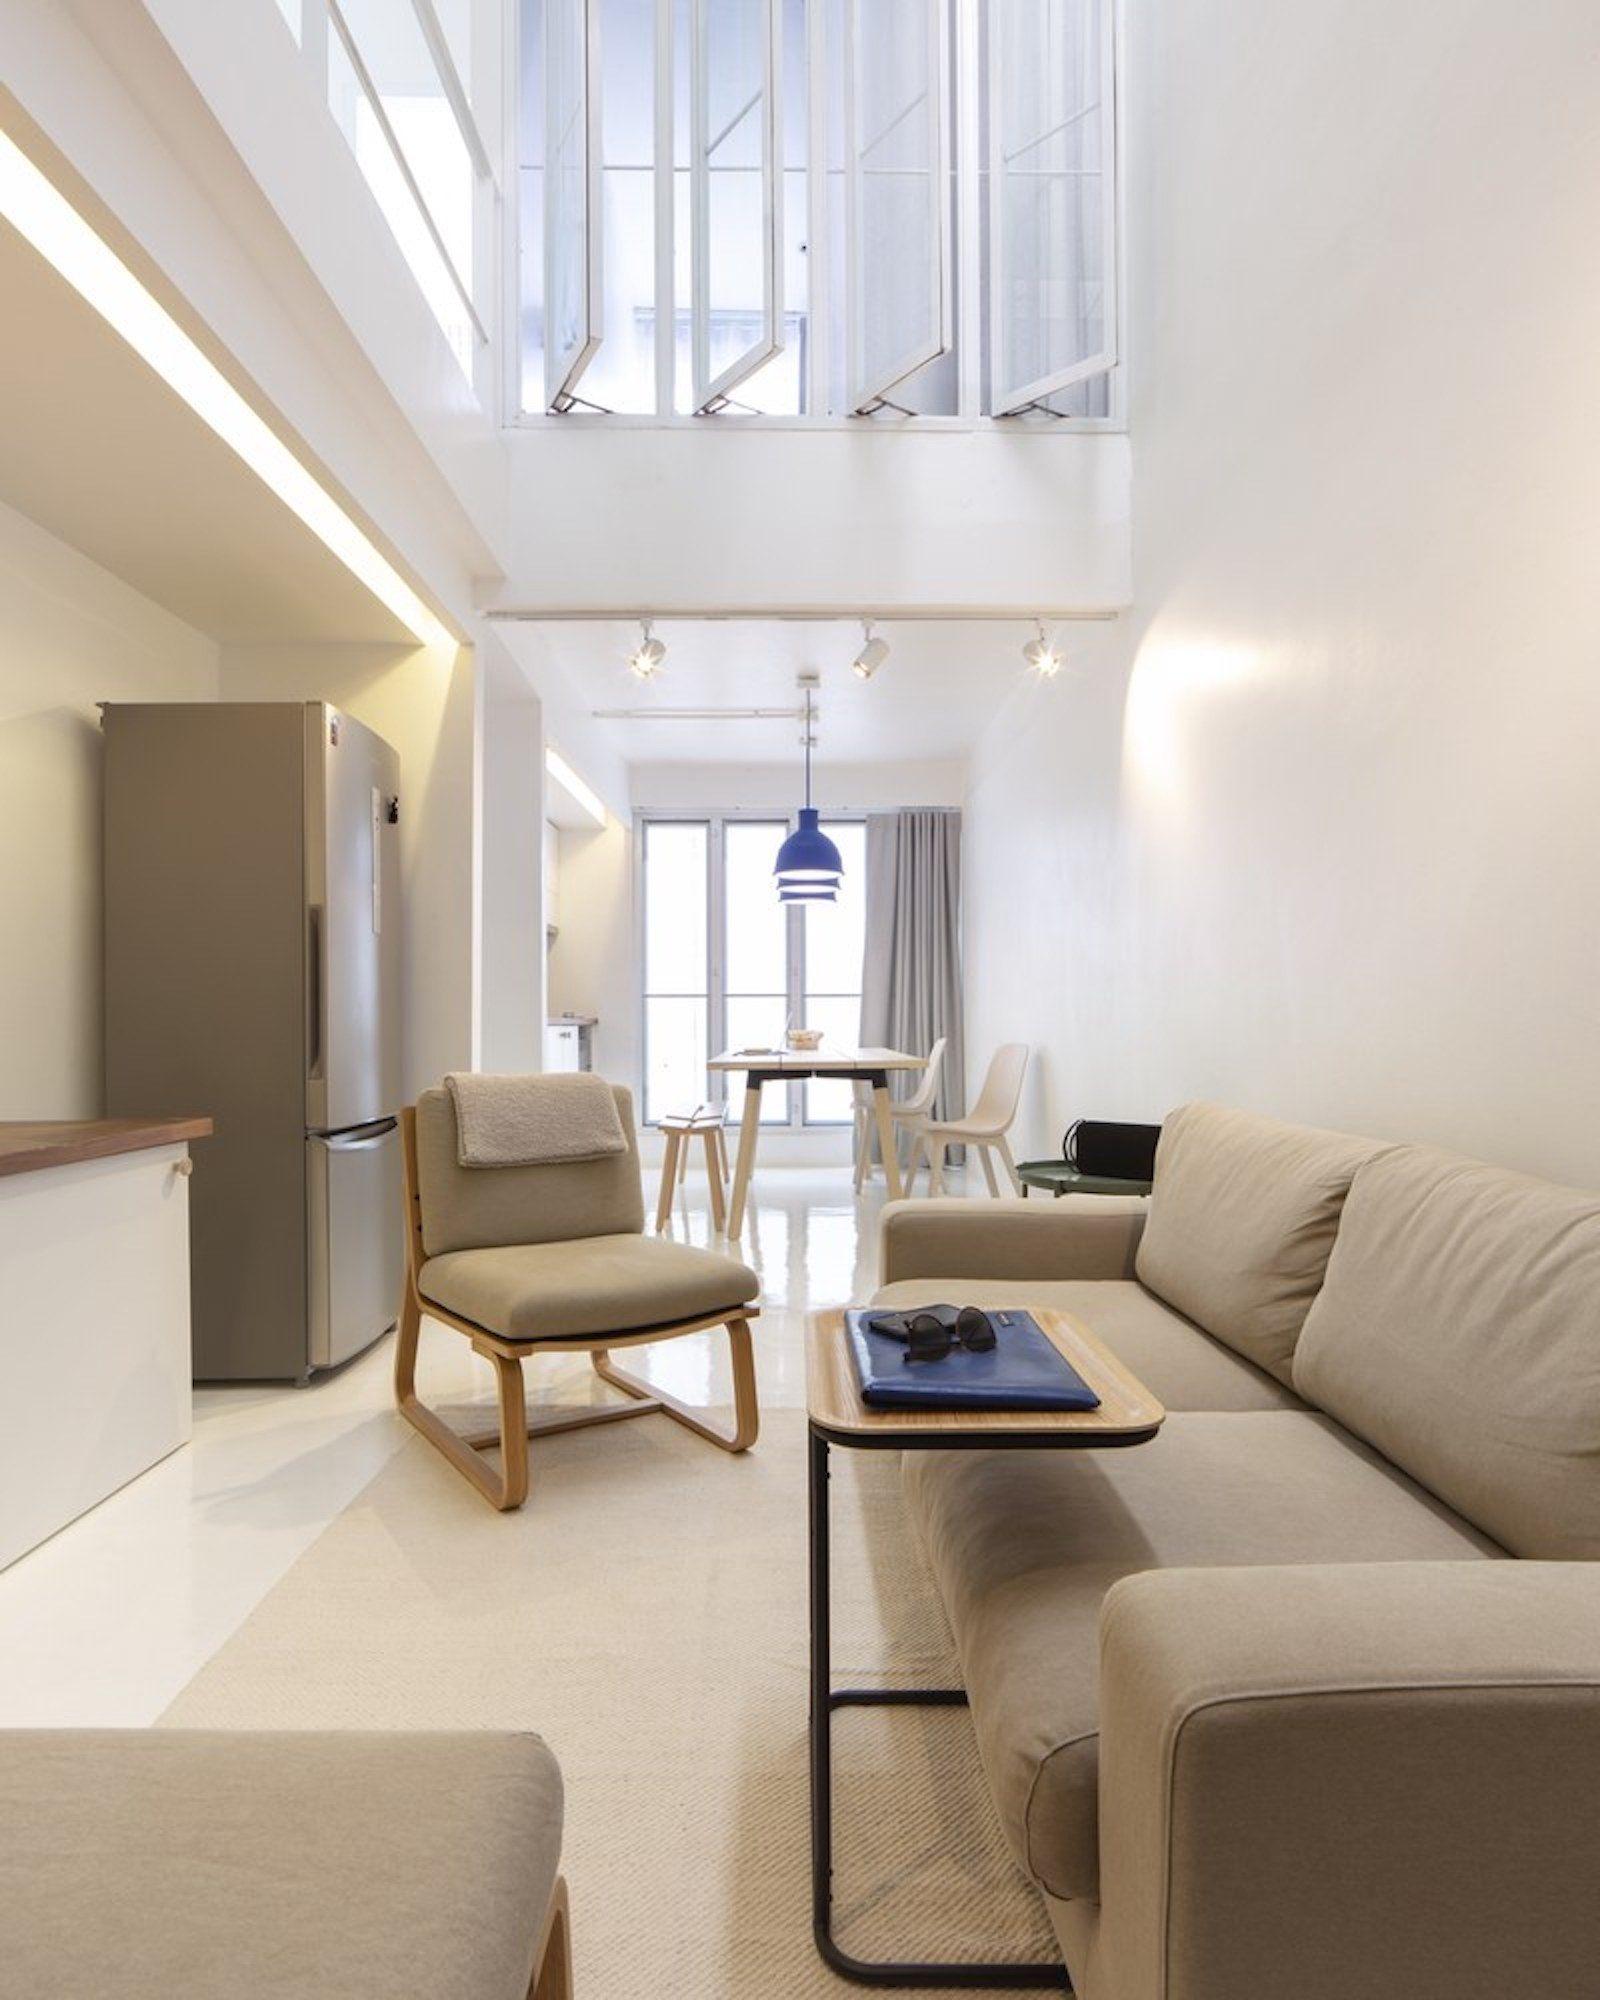 IGNANT-Architecture-A-Milimetre-HSH-House-010